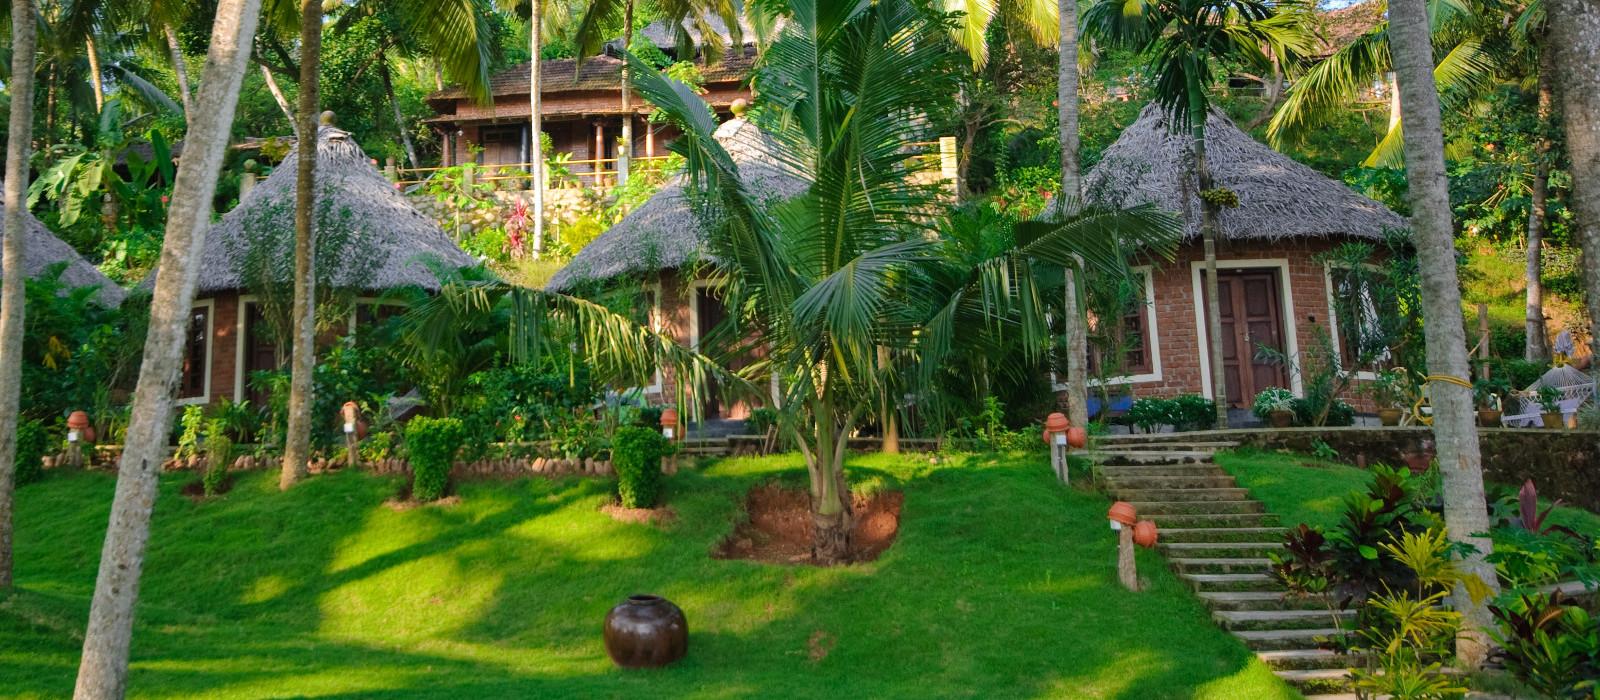 Hotel Somatheeram Islands & Beaches